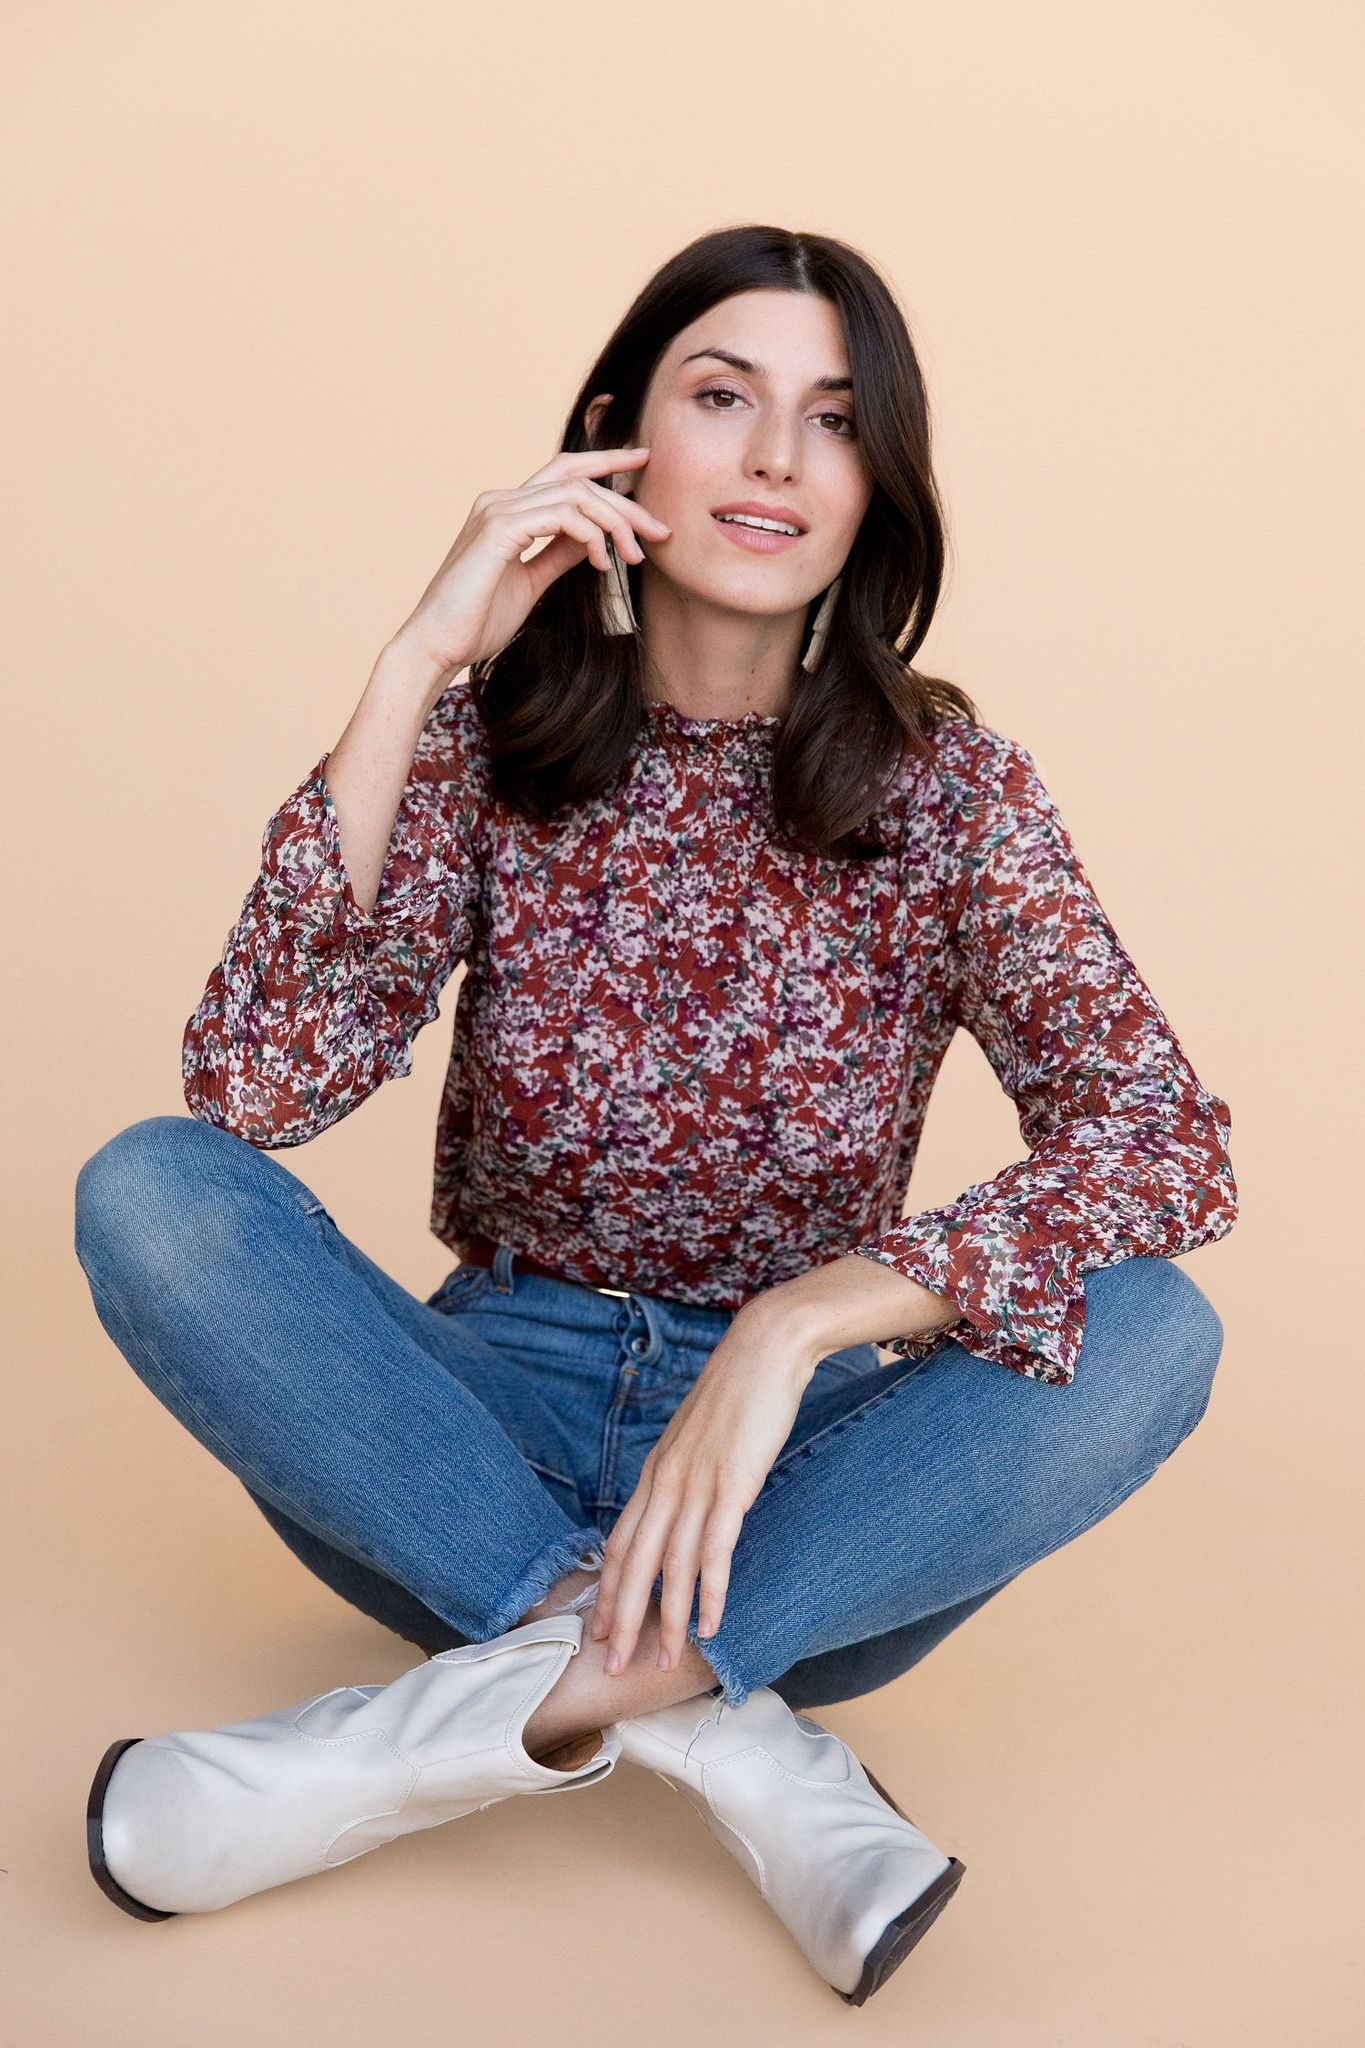 Andi Blouse - Merlot Floral